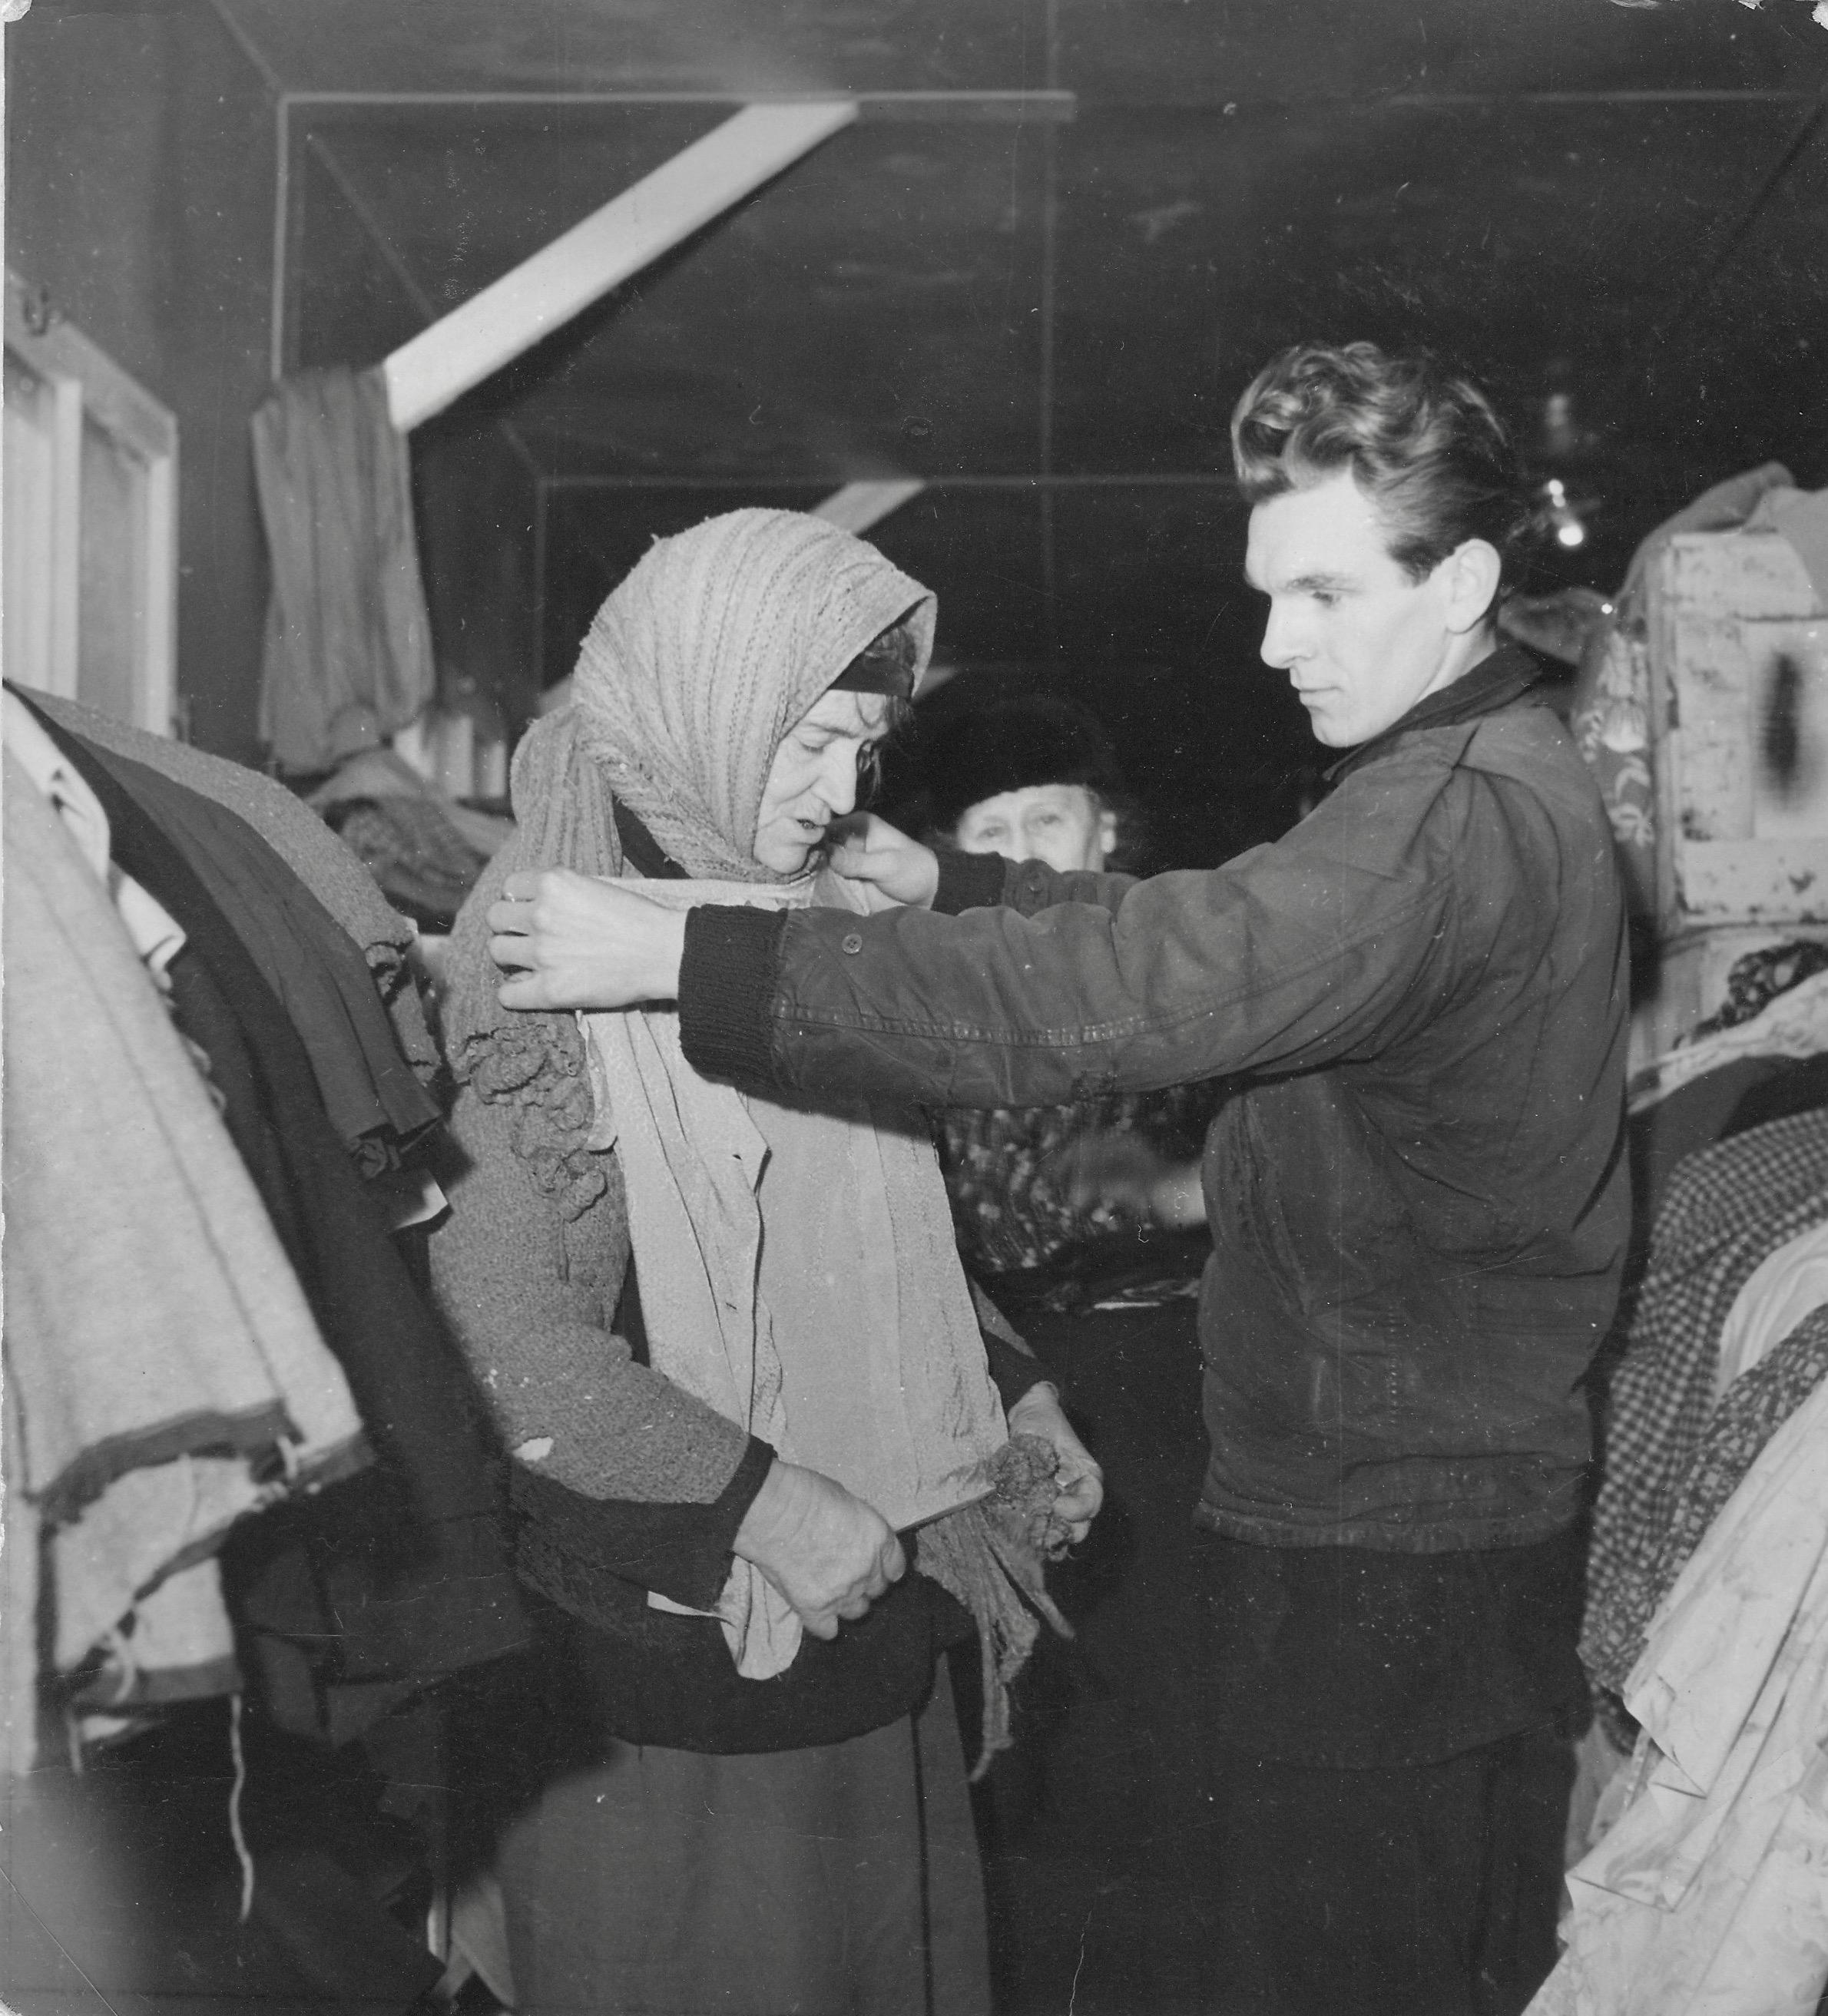 San Sabba clothing distribution 1950-51